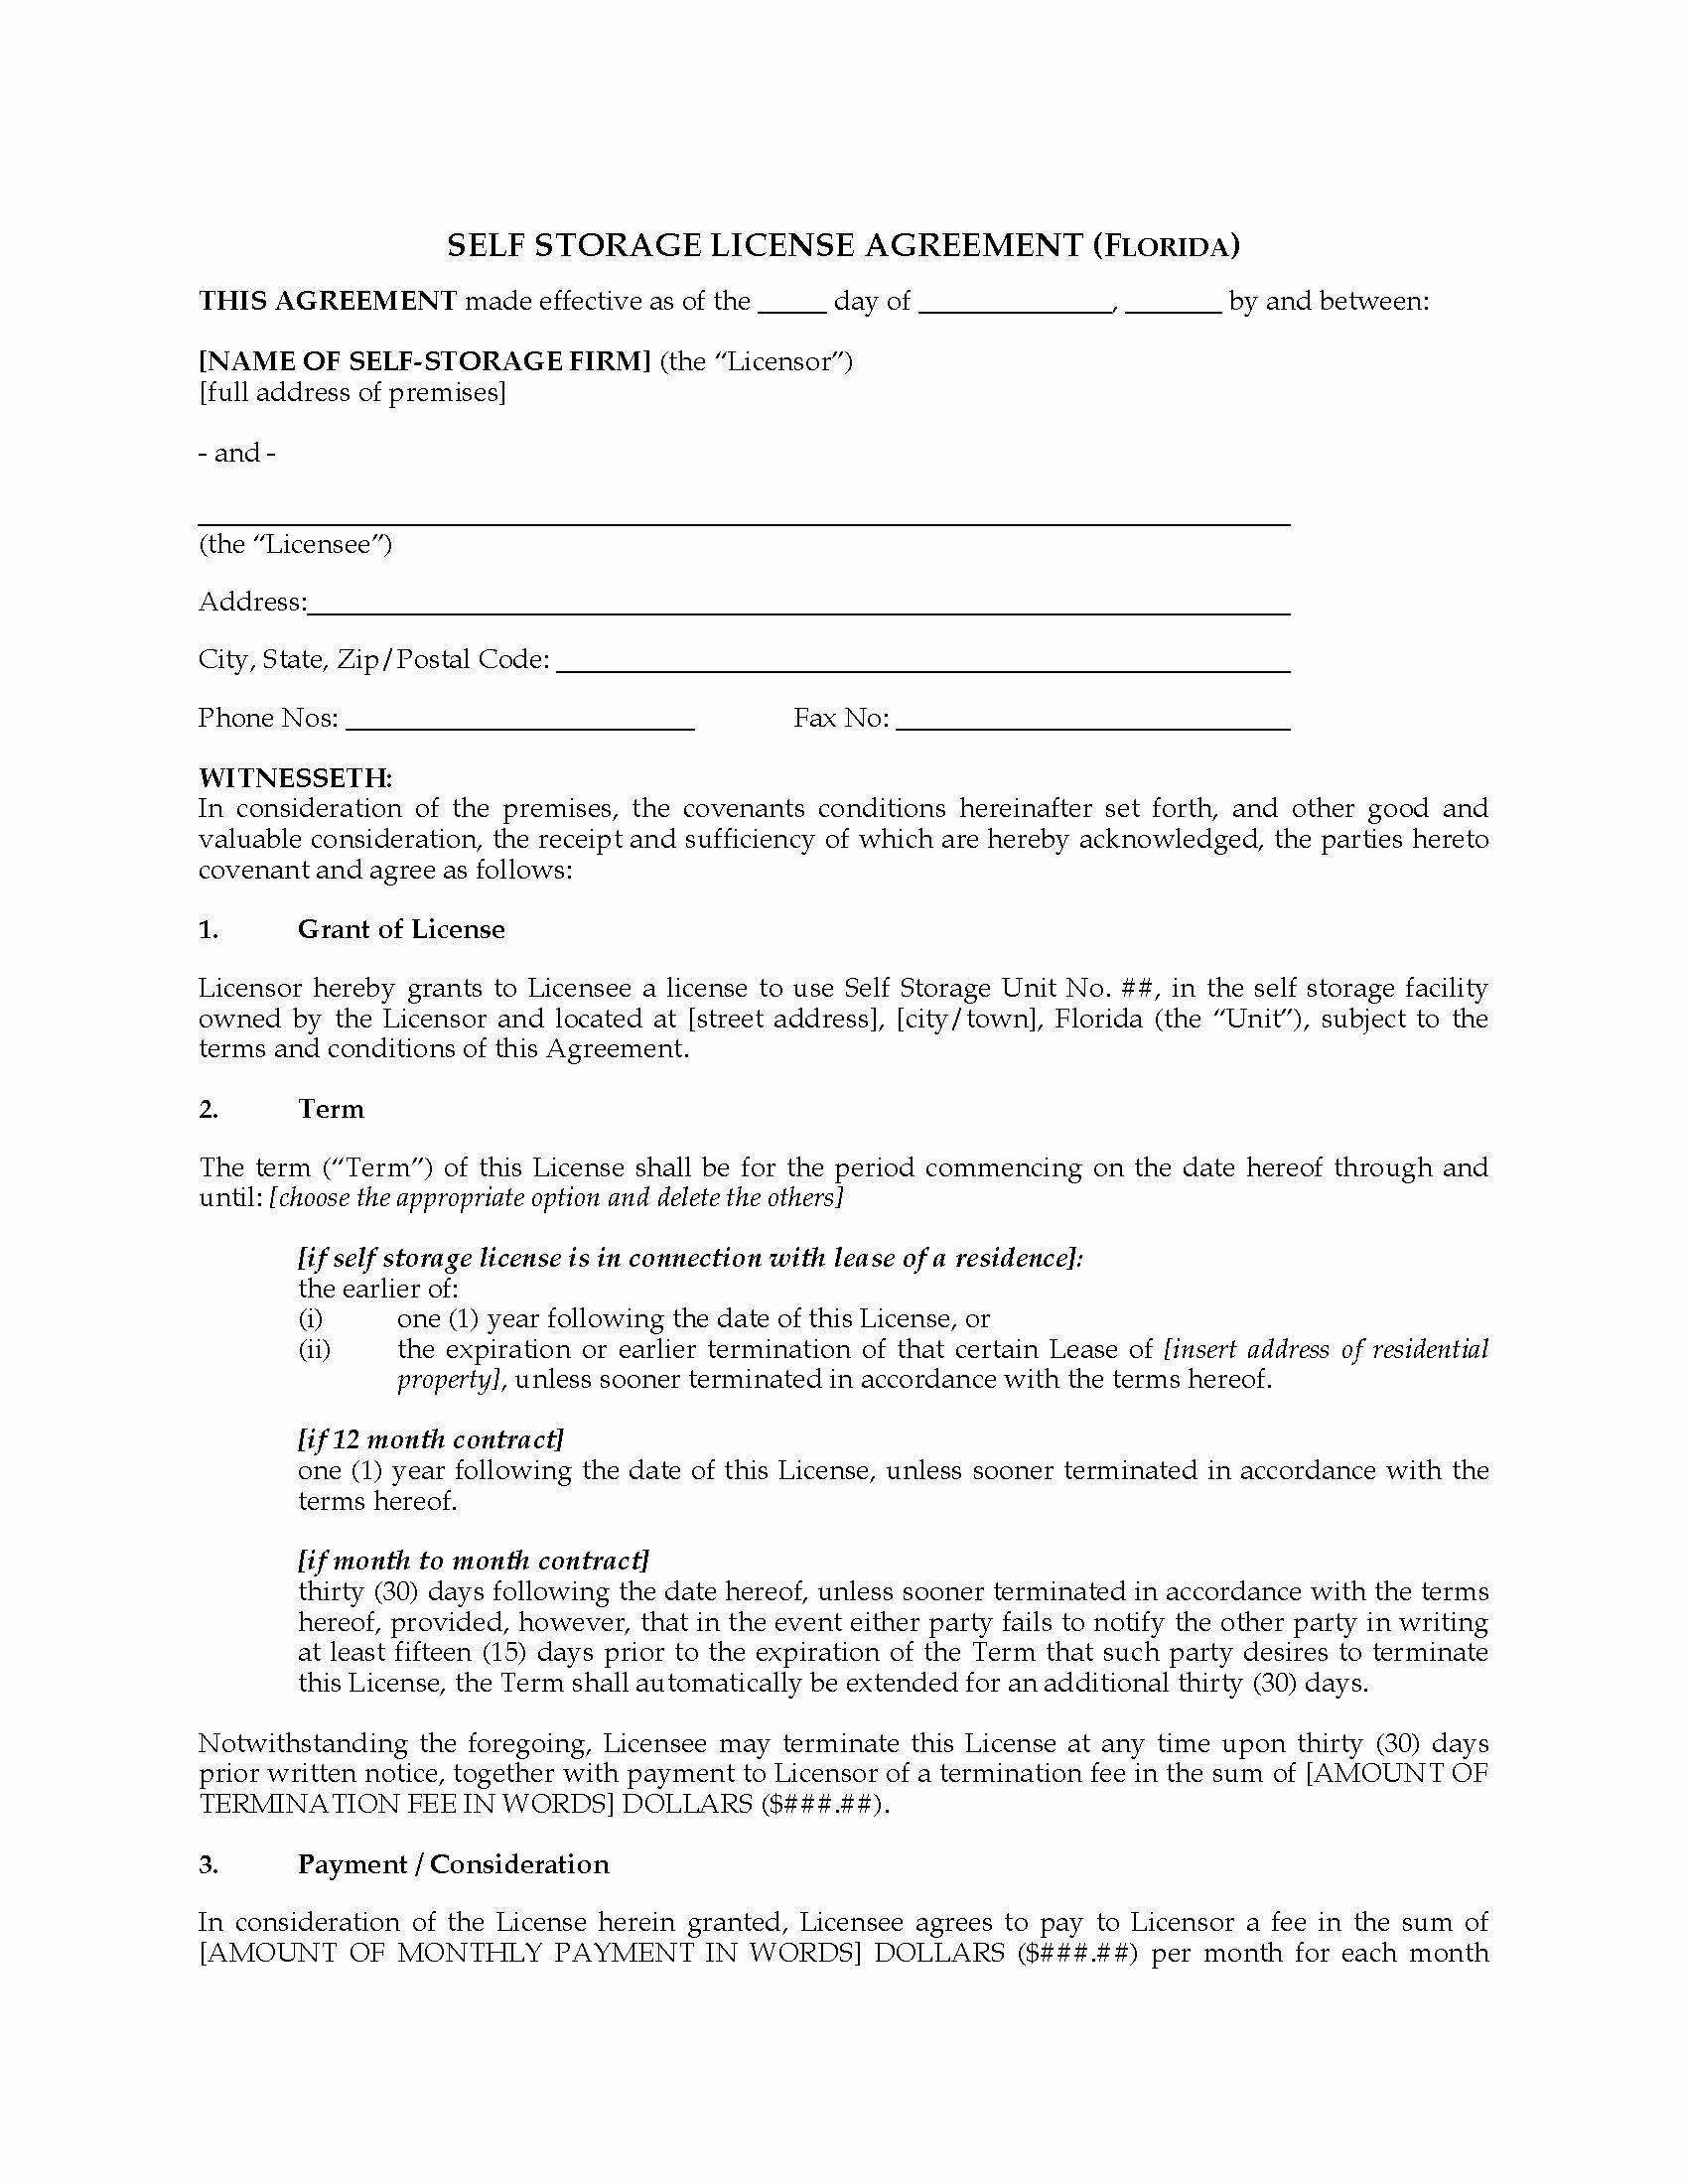 Vehicle Storage Contract Template Elegant Florida Self Storage License Agreement